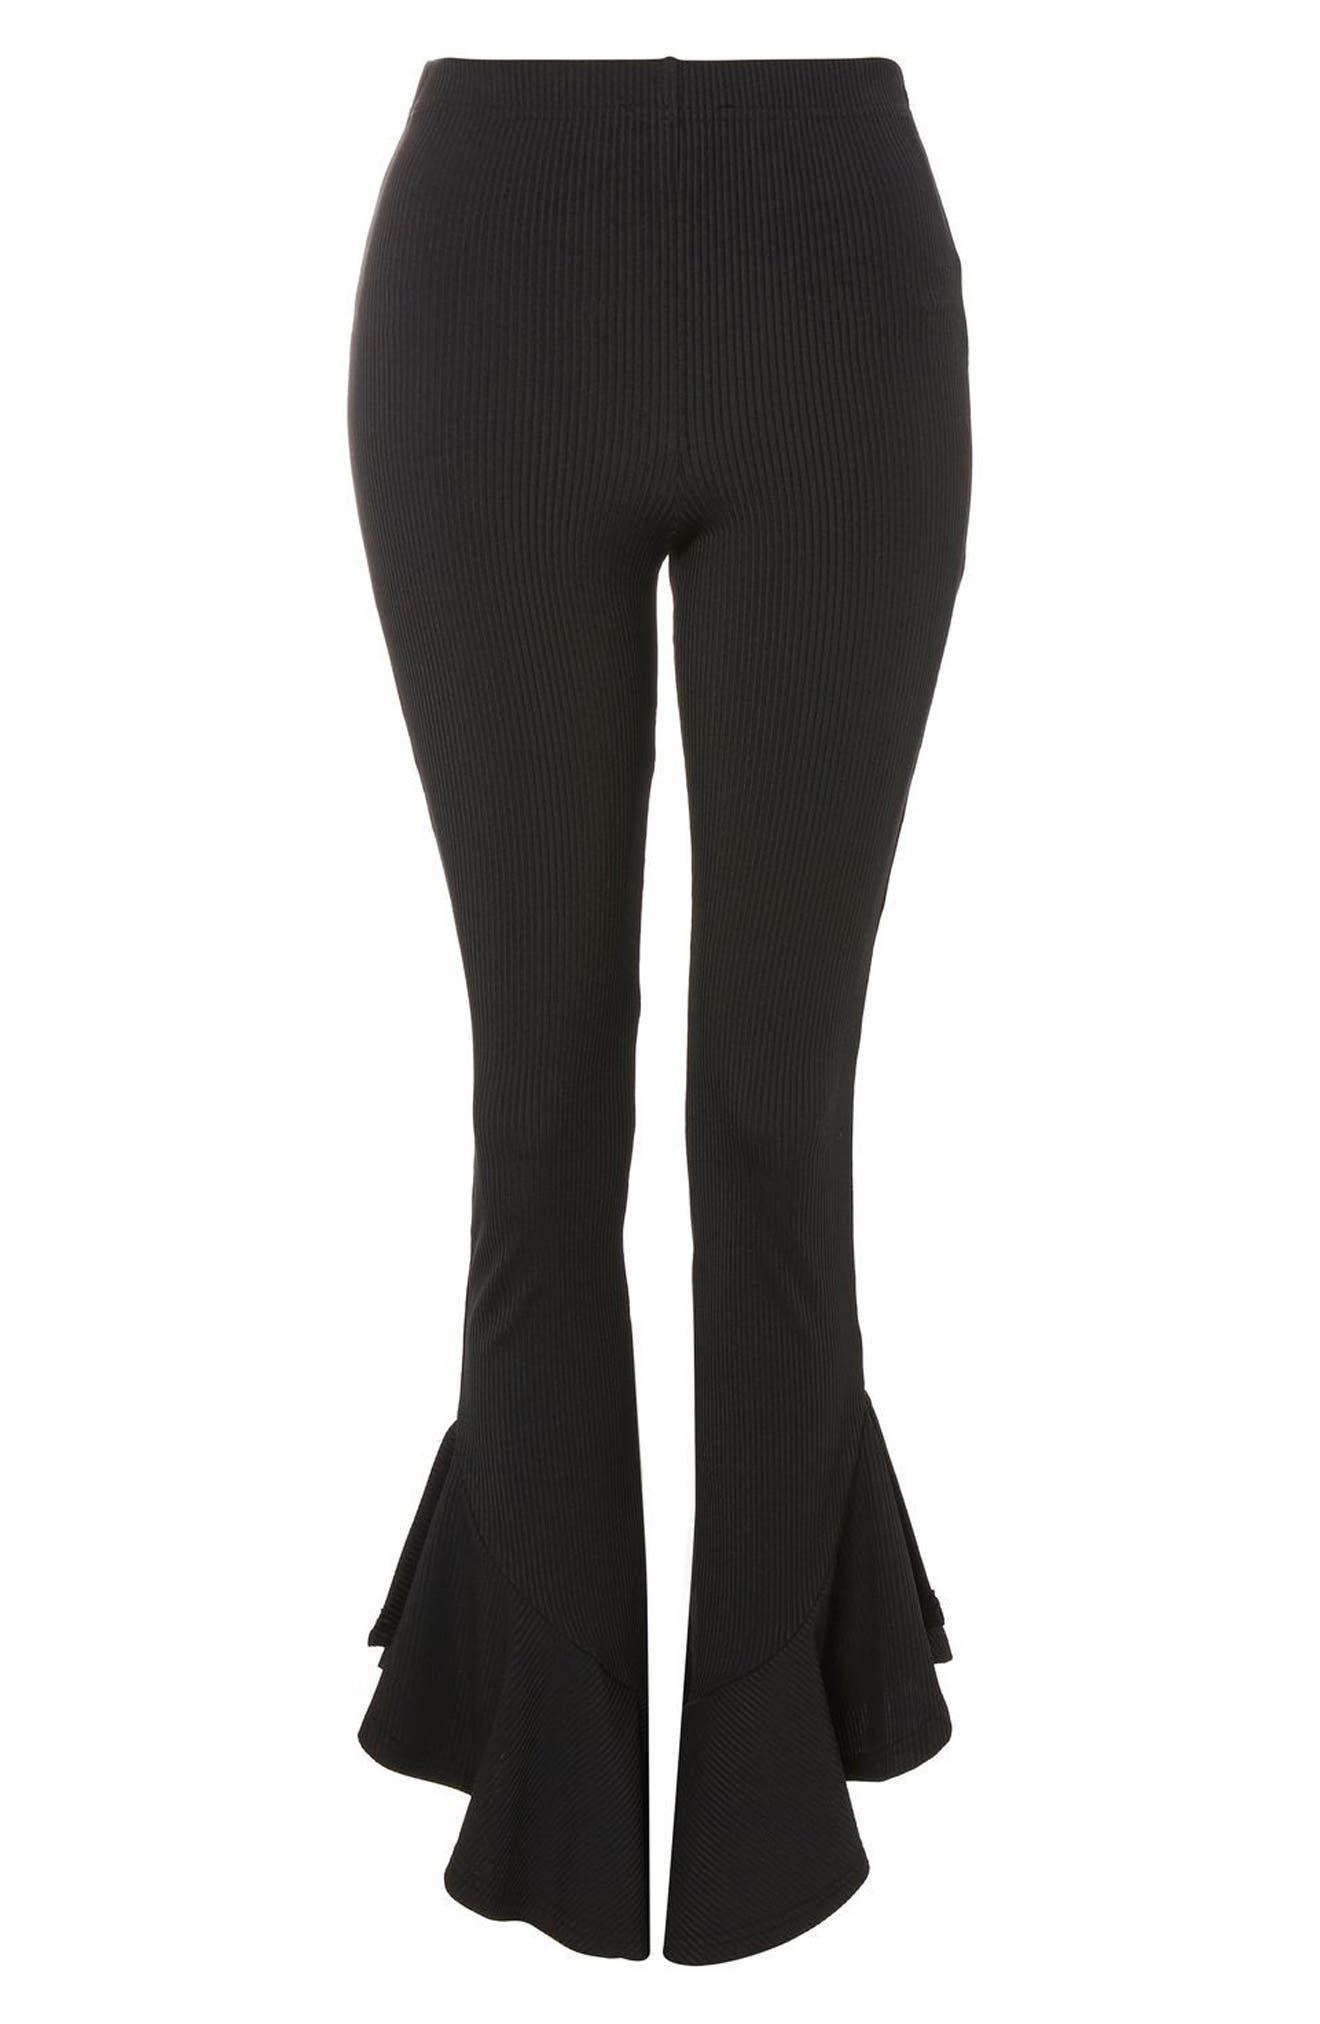 Mermaid Frill Flare Trousers,                             Alternate thumbnail 4, color,                             Black